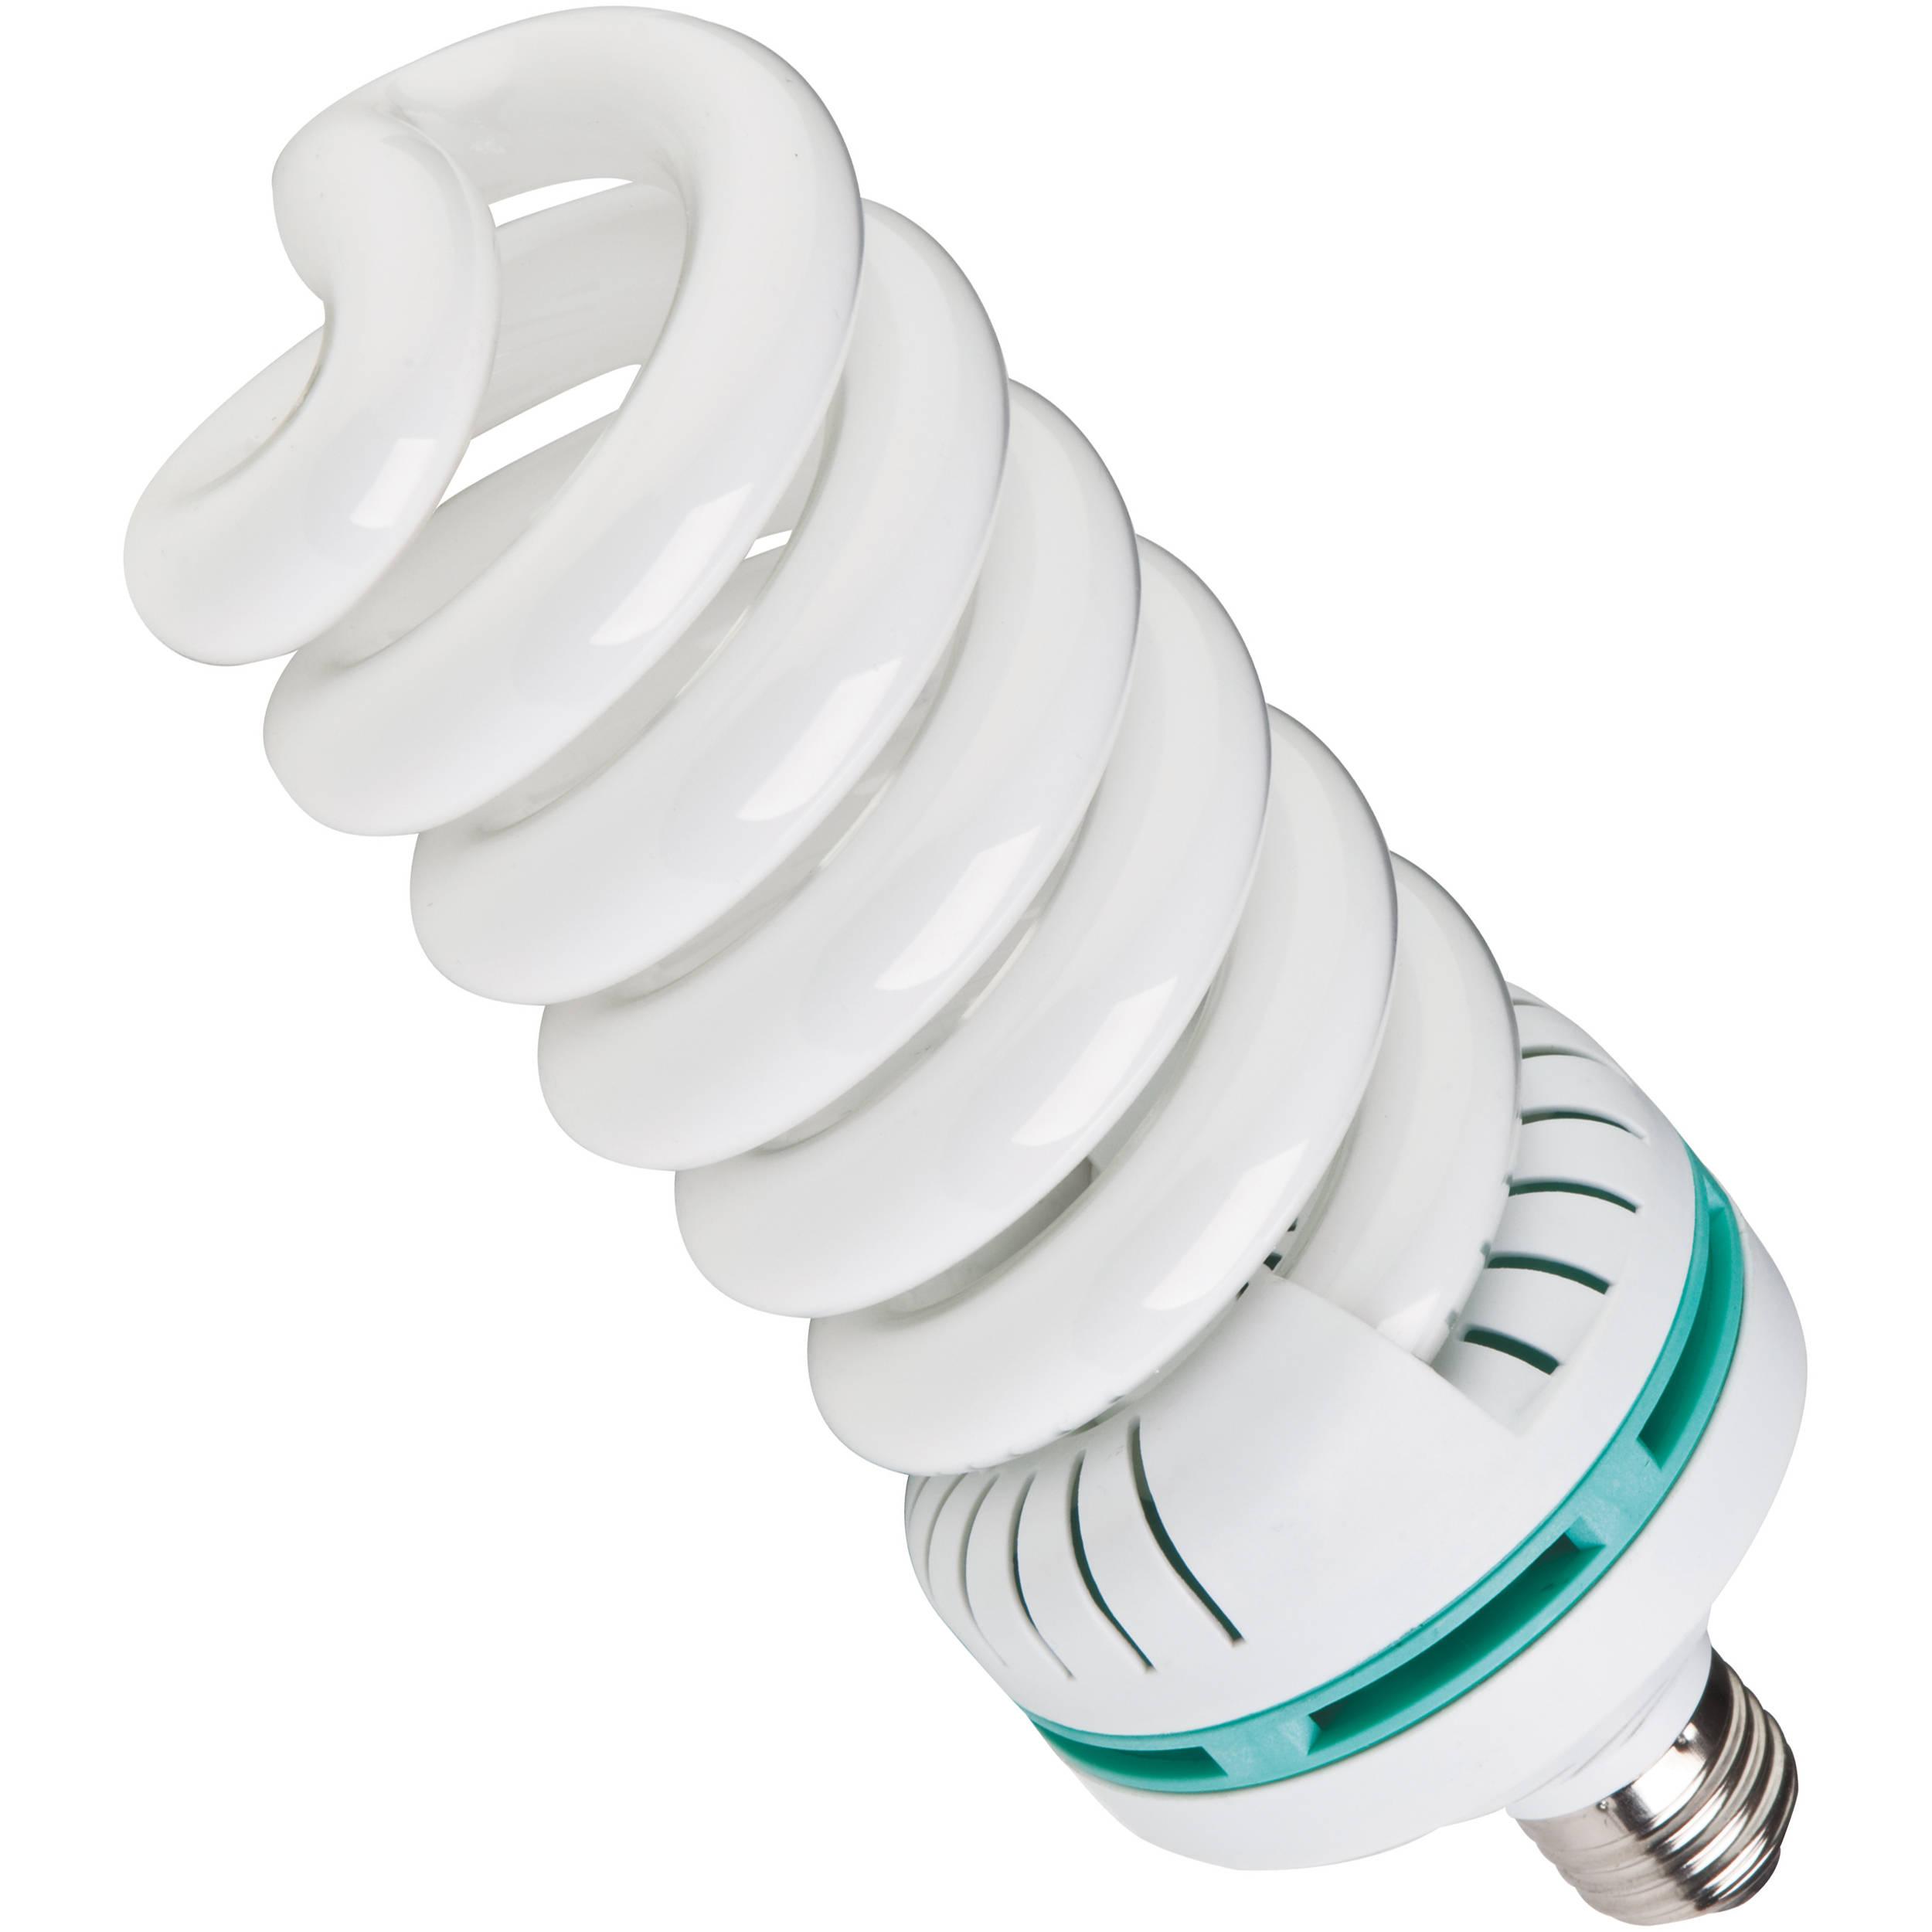 Westcott Daylight Fluorescent Bulb For Ulite 85w 418 B H Photo